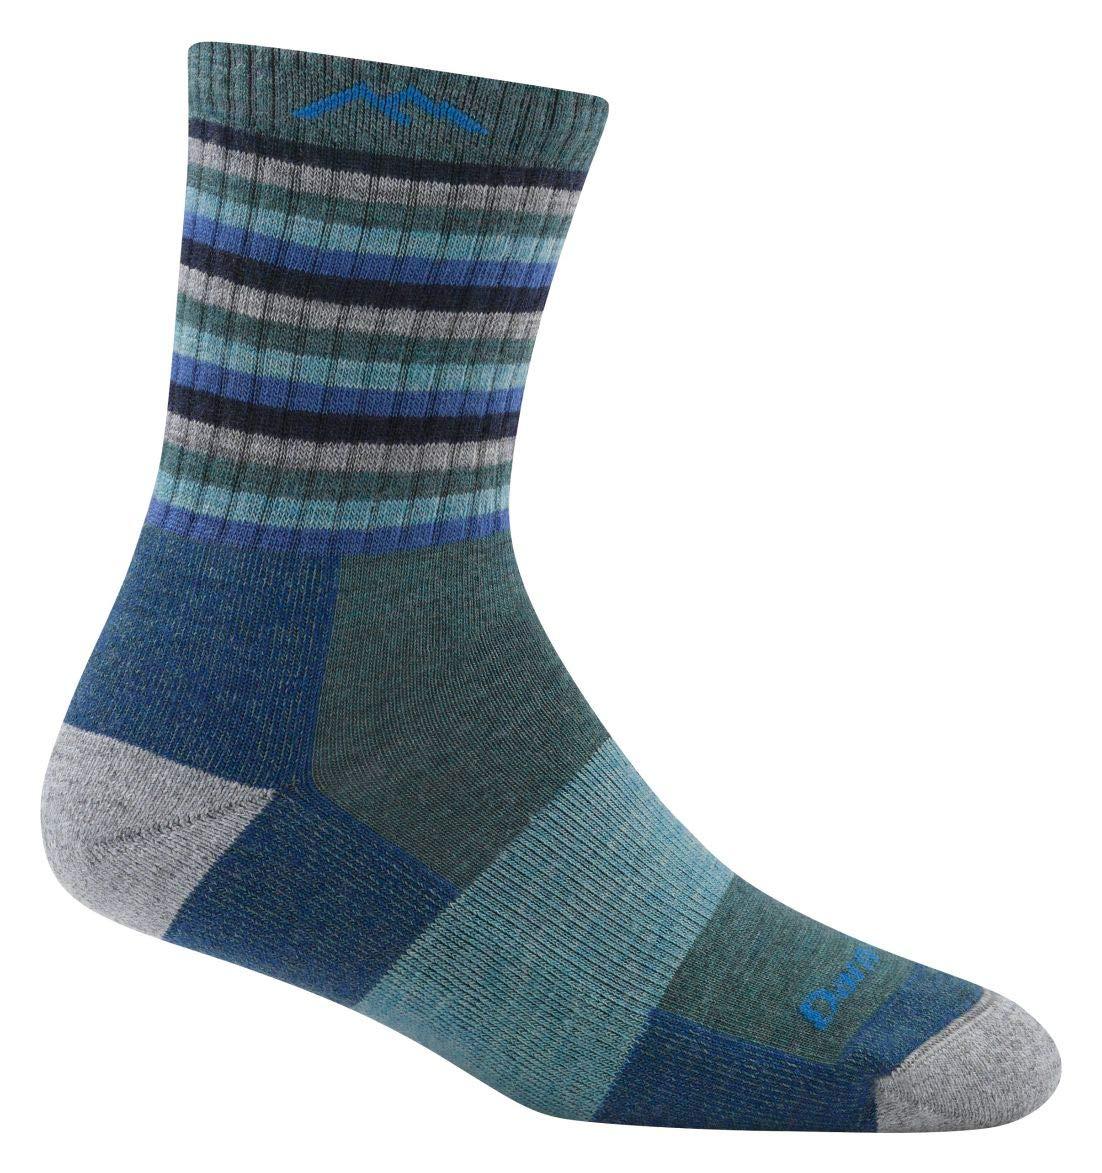 Darn Tough Hike/Trek Micro Cushion Stripe Crew Socks - Women's Aqua Stripe Large by Darn Tough